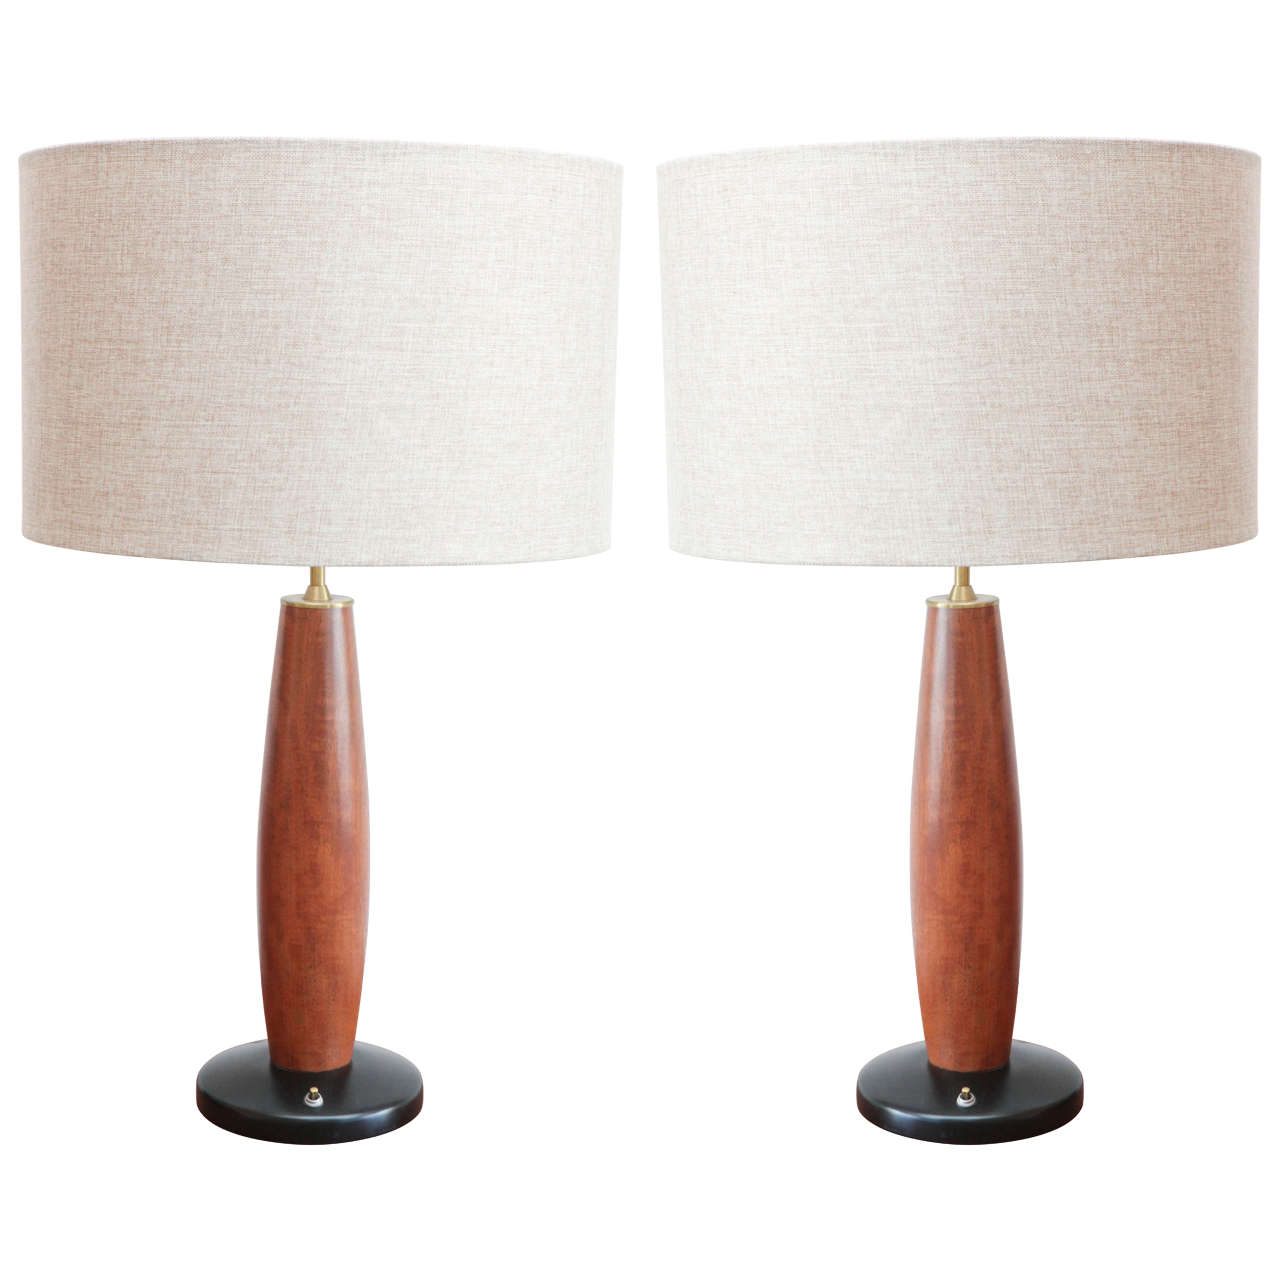 mid century modern table lamps at 1stdibs. Black Bedroom Furniture Sets. Home Design Ideas